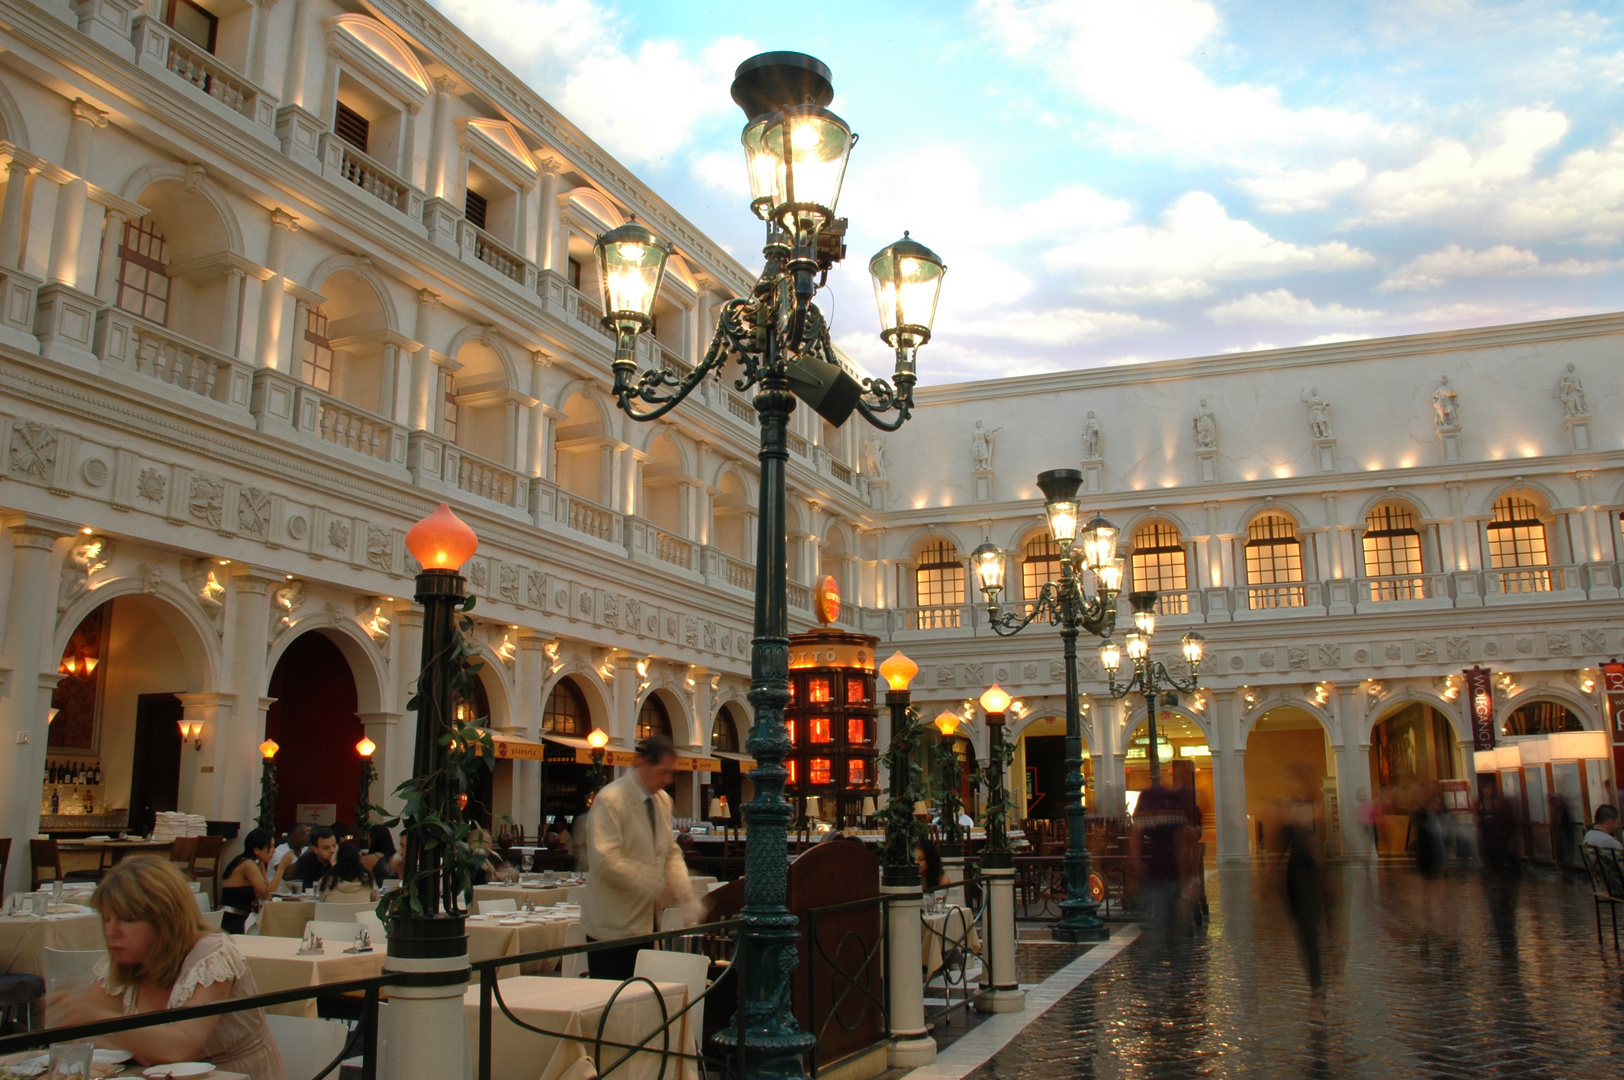 Venedig.Markusplatz.Oder doch Vegas?